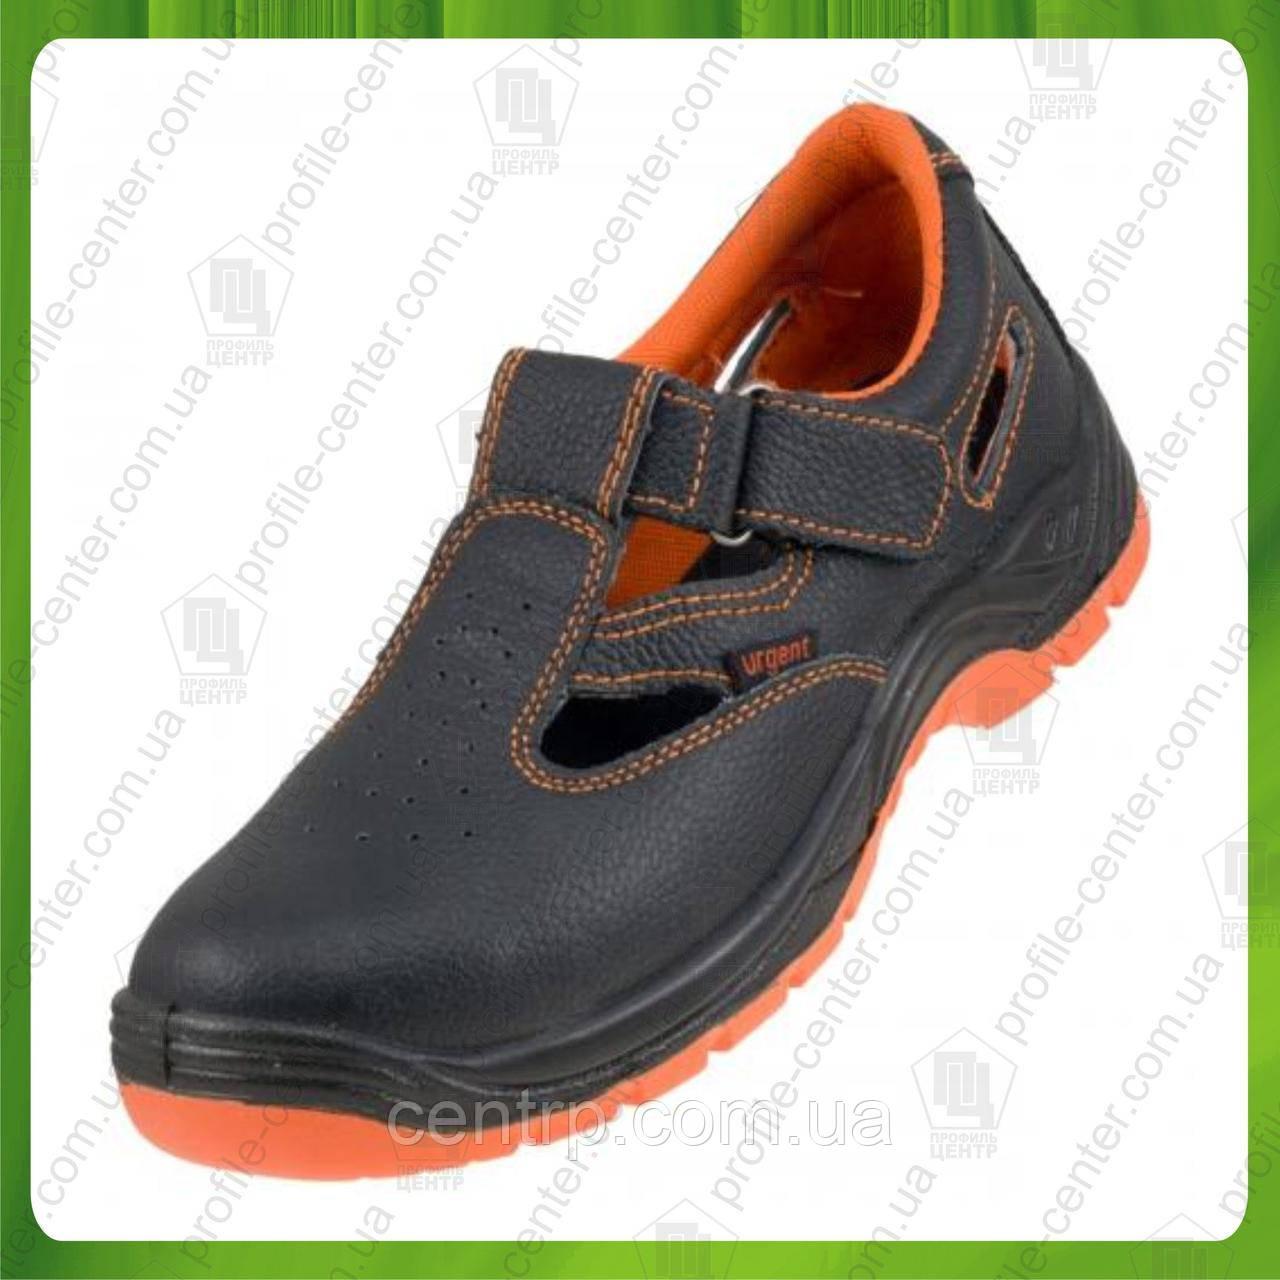 Рабочие сандалии с металлическим носком URGENT 301 S1 (натур.кожа)